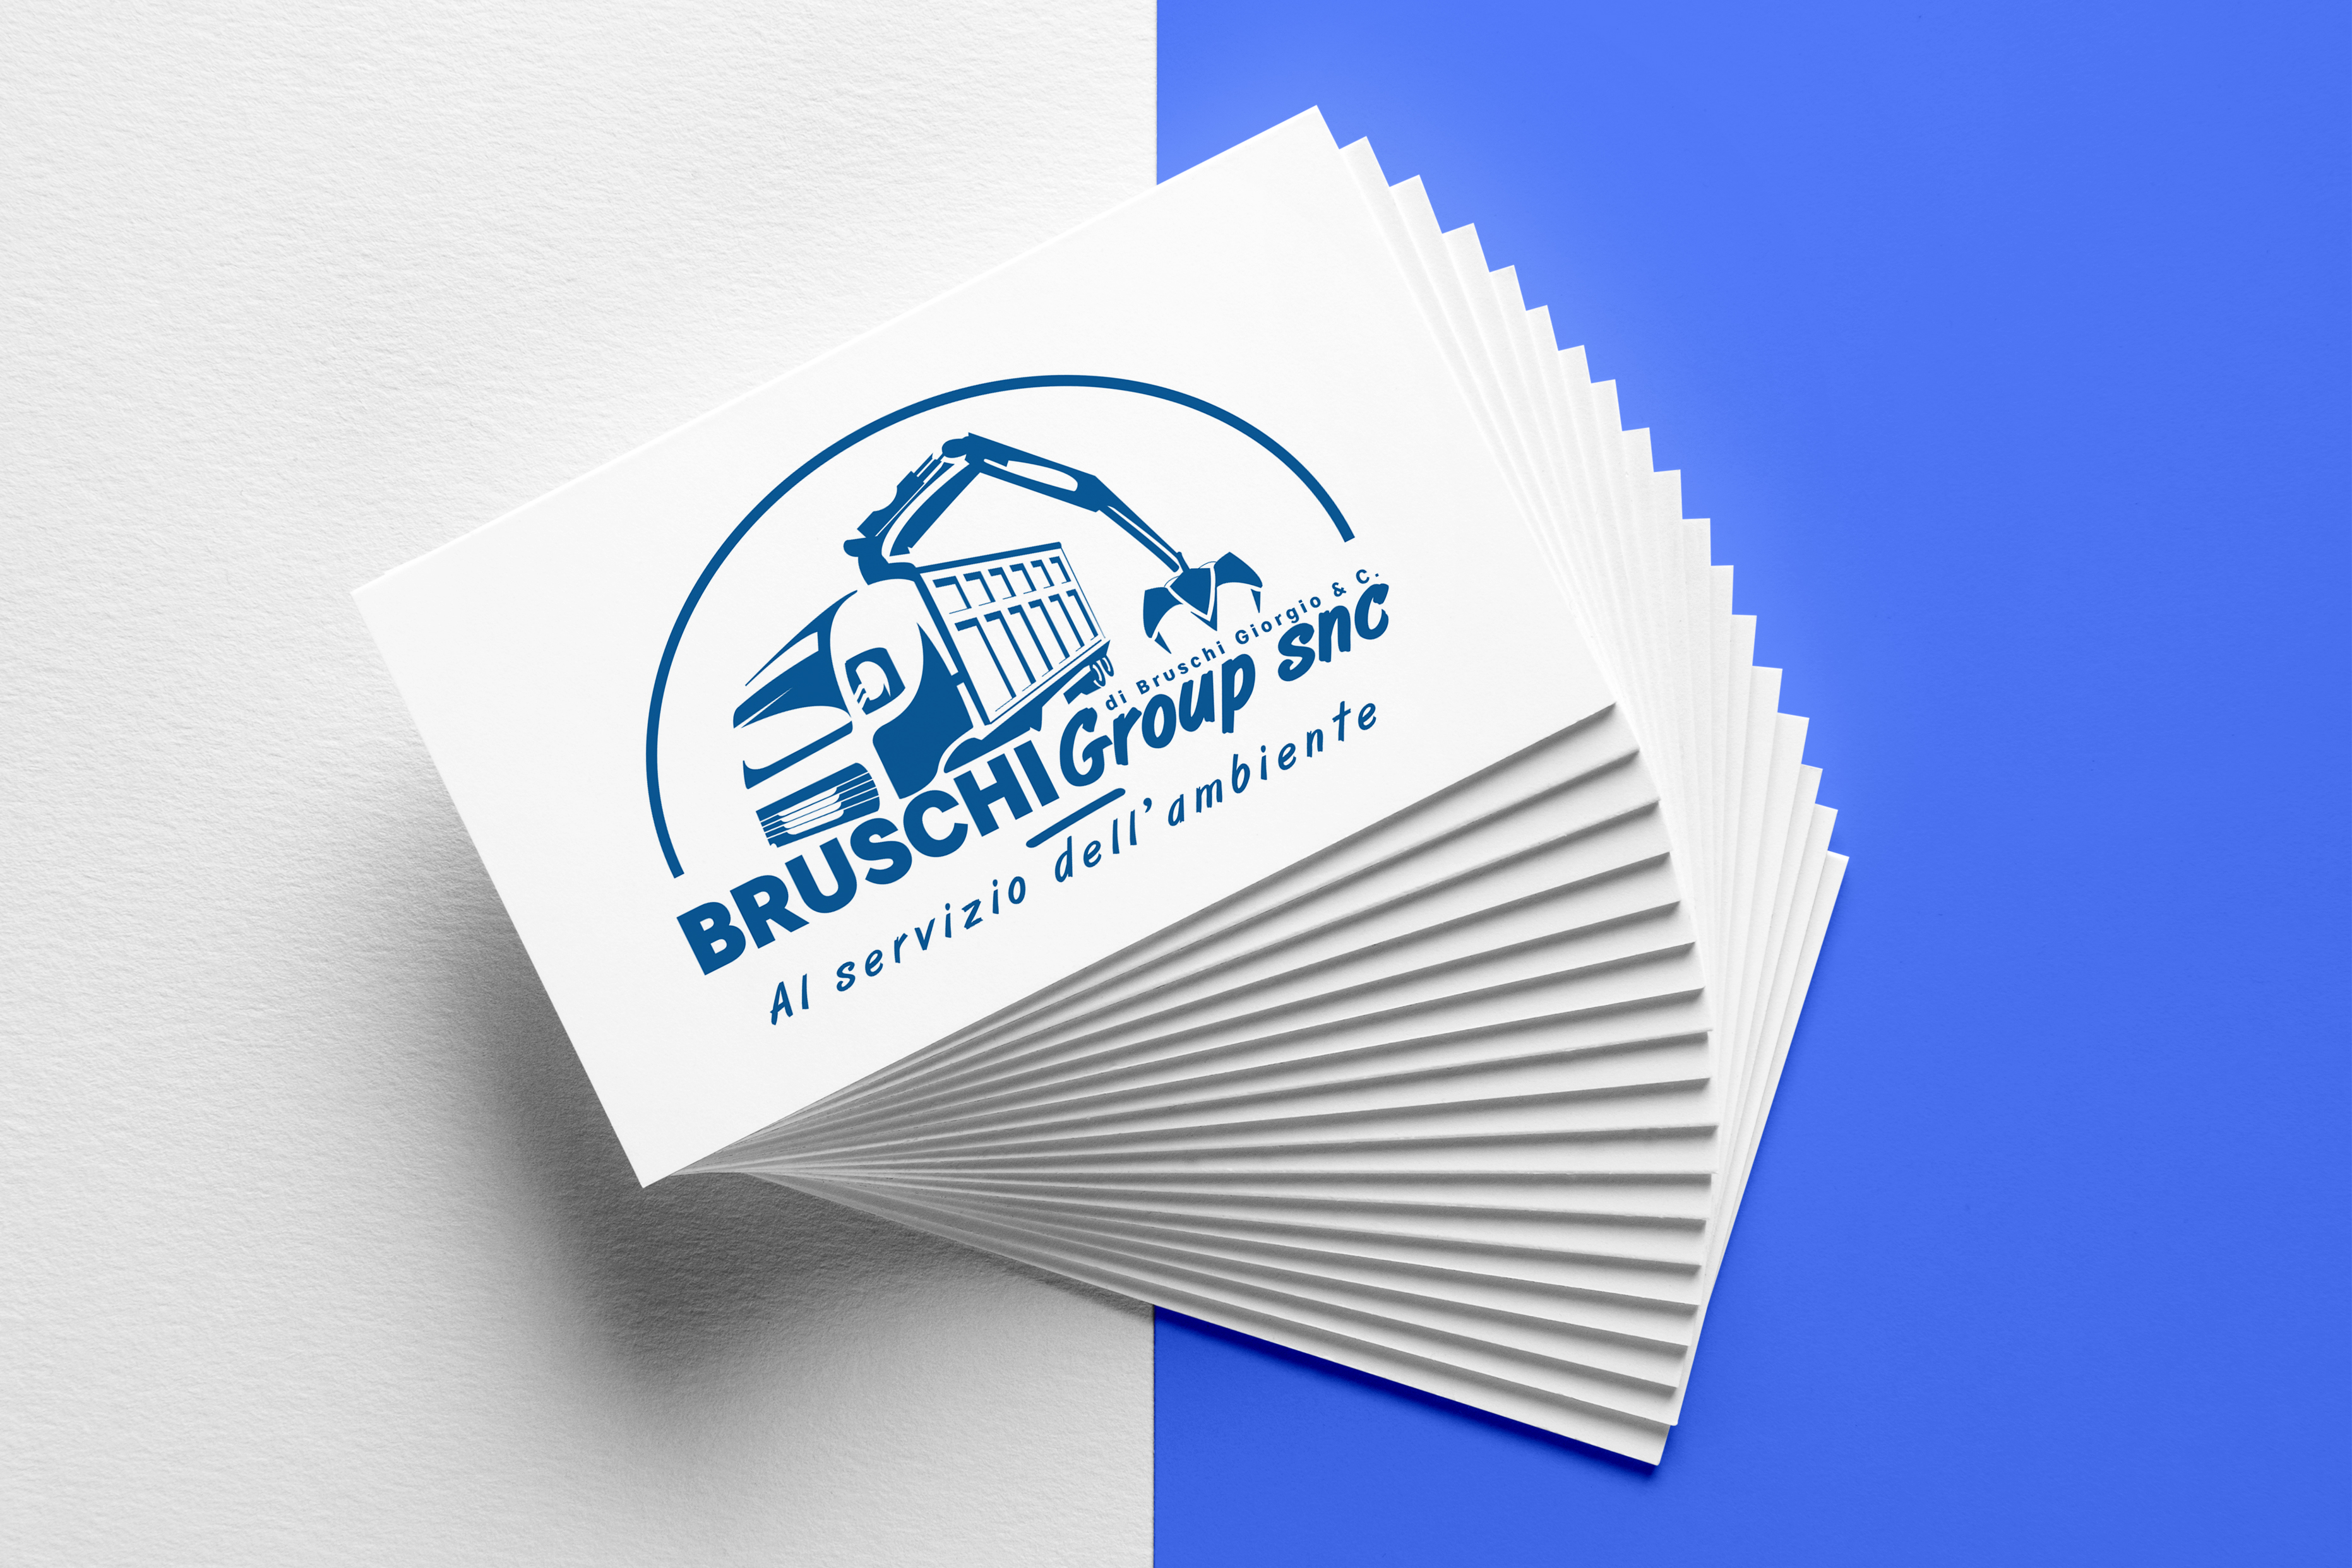 Bruschi Group